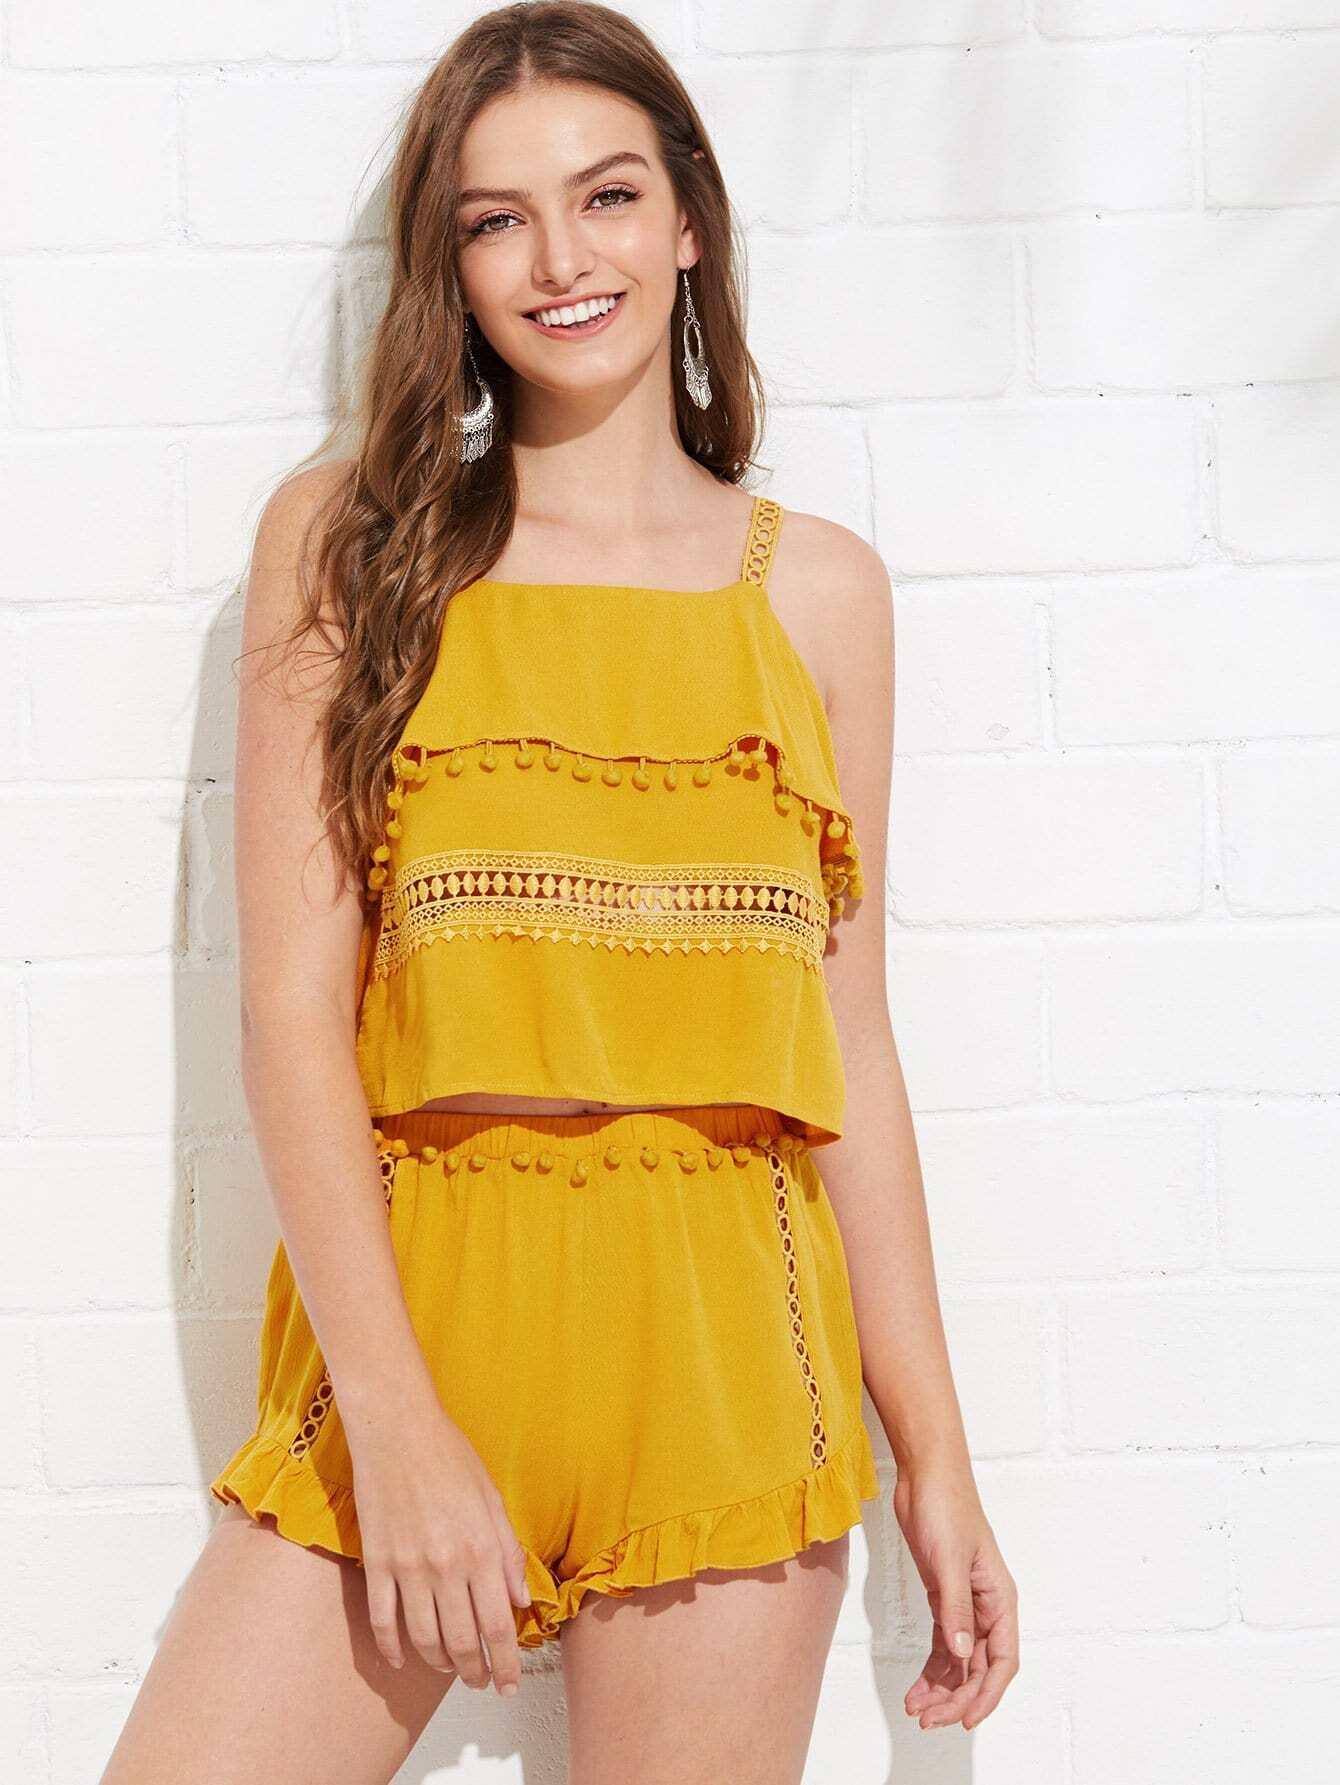 Lace and Pom Pom Detail Ruffle Top & Shorts Set pom pom trim aztec cami and shorts pajama set